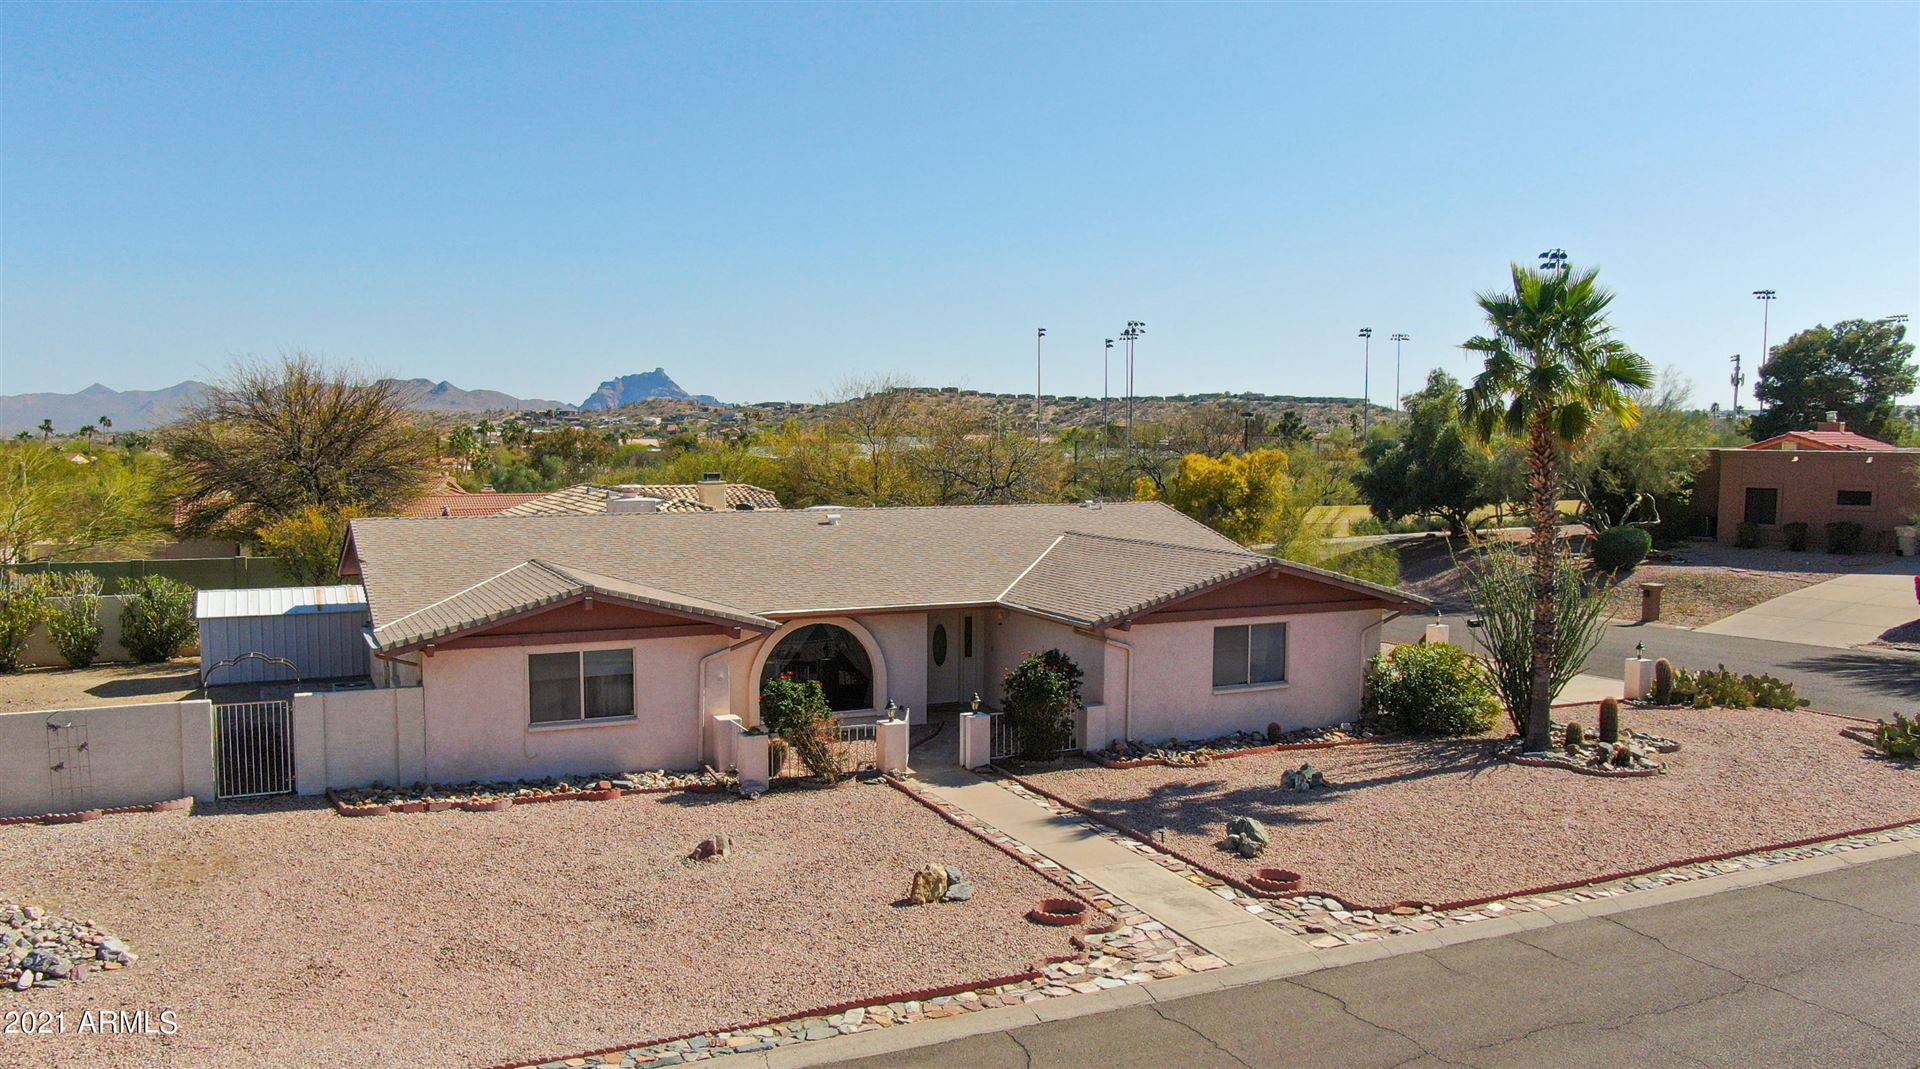 14851 N EL SOBRANTE Avenue, Fountain Hills, AZ 85268 - MLS#: 6215074